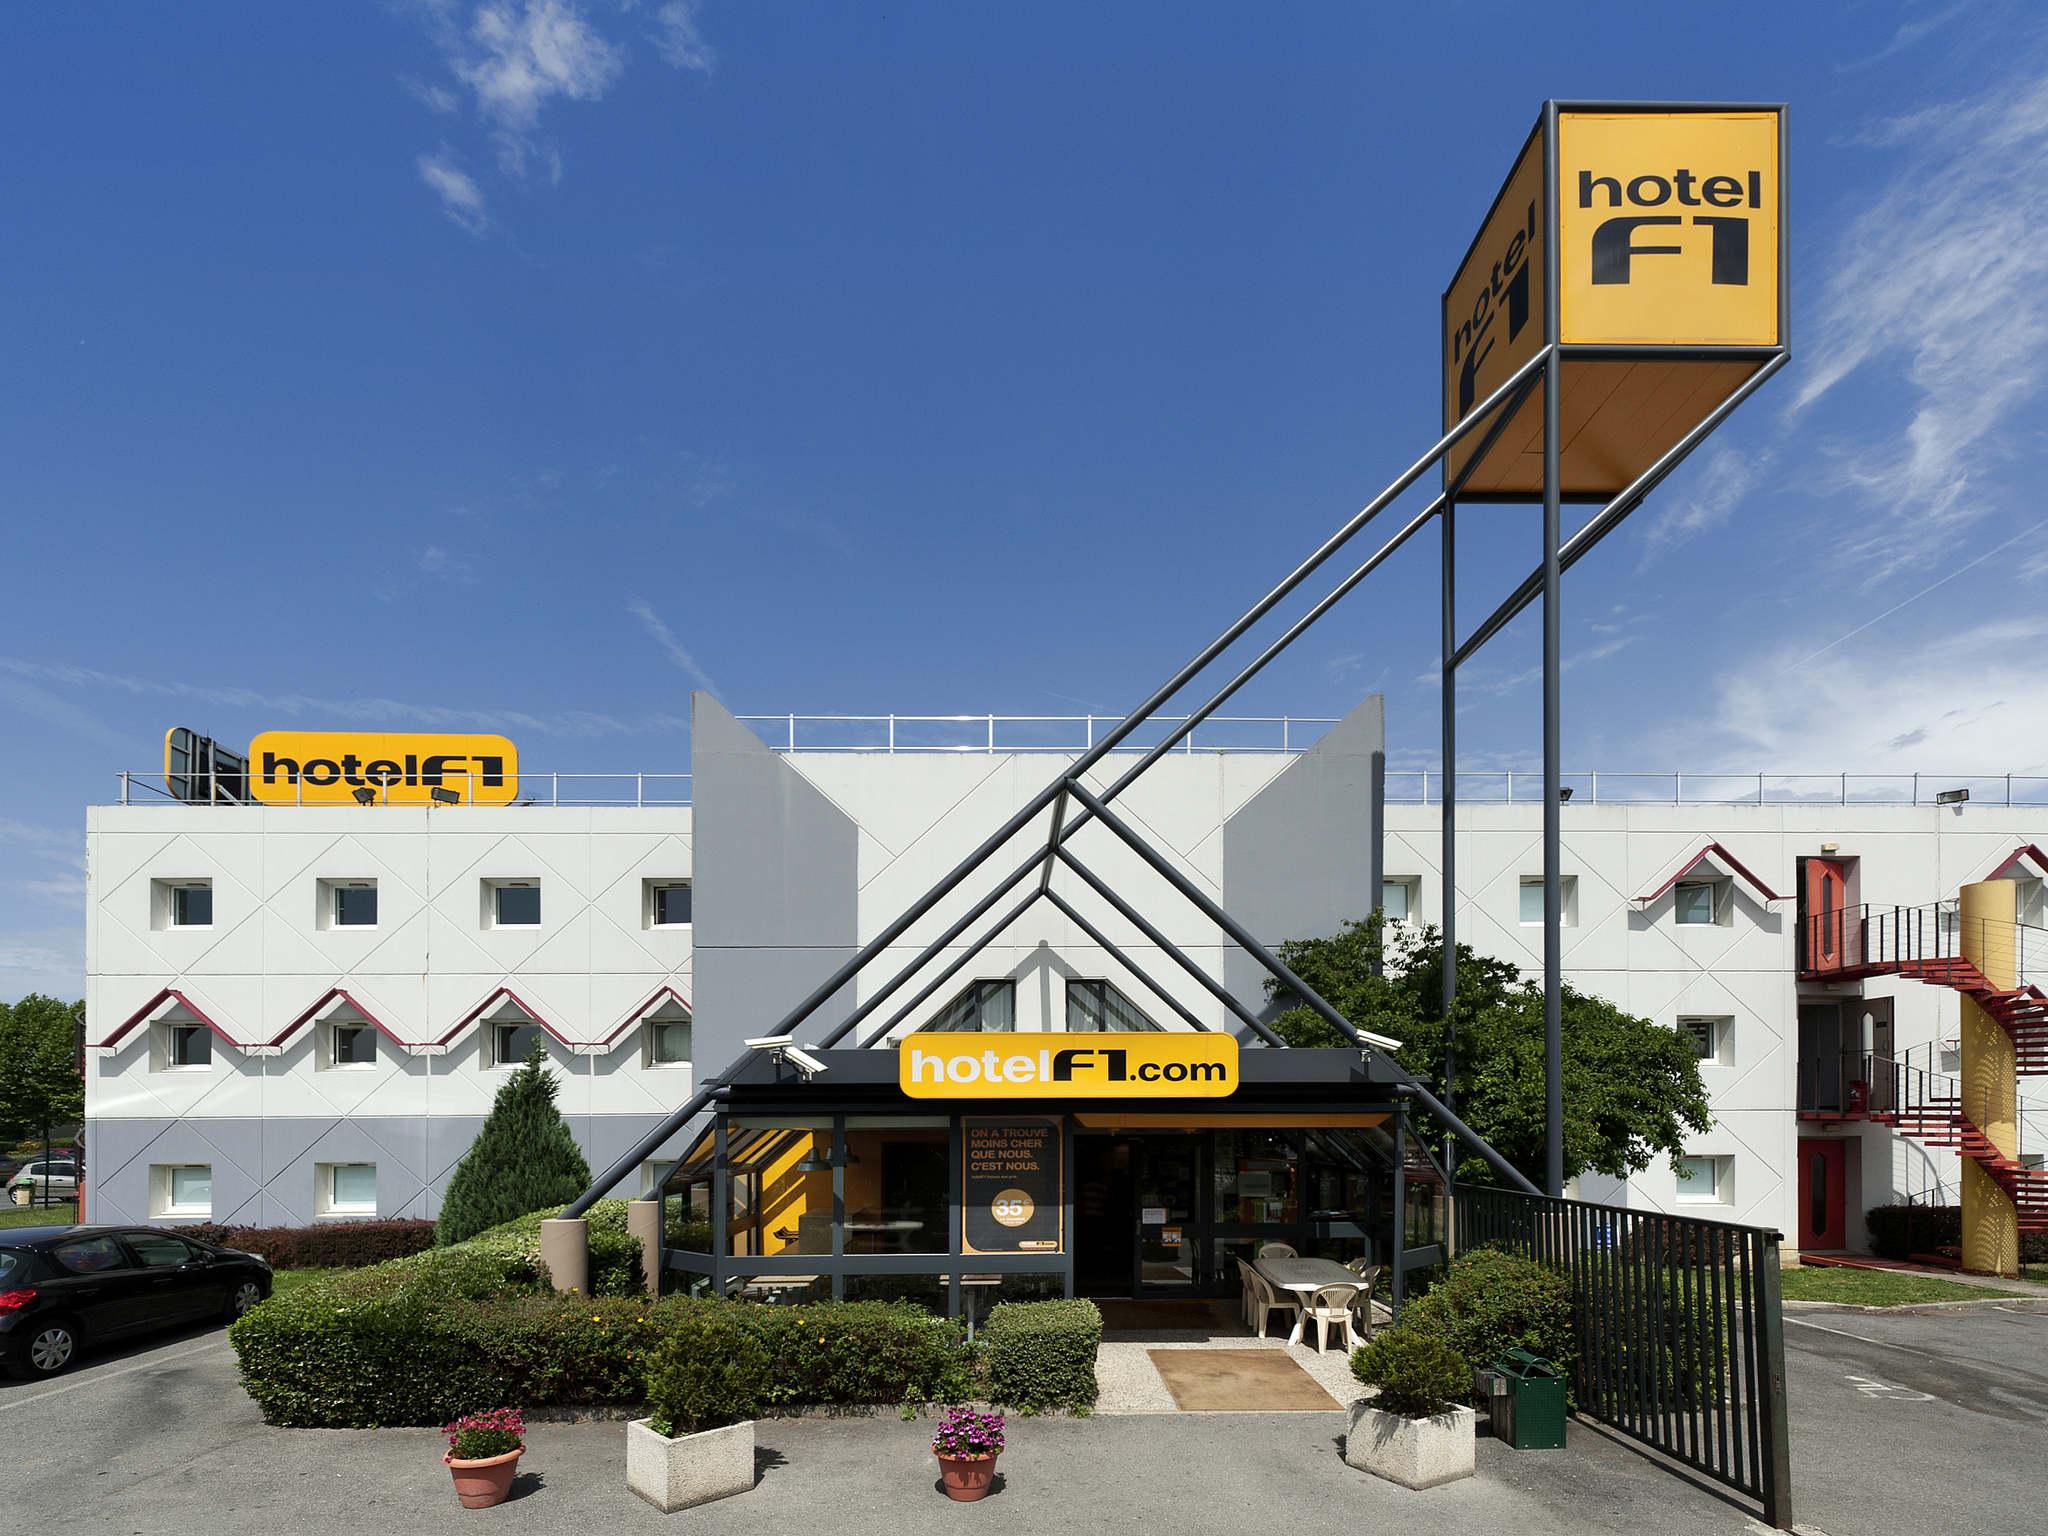 Hotel – hotelF1 Mennecy